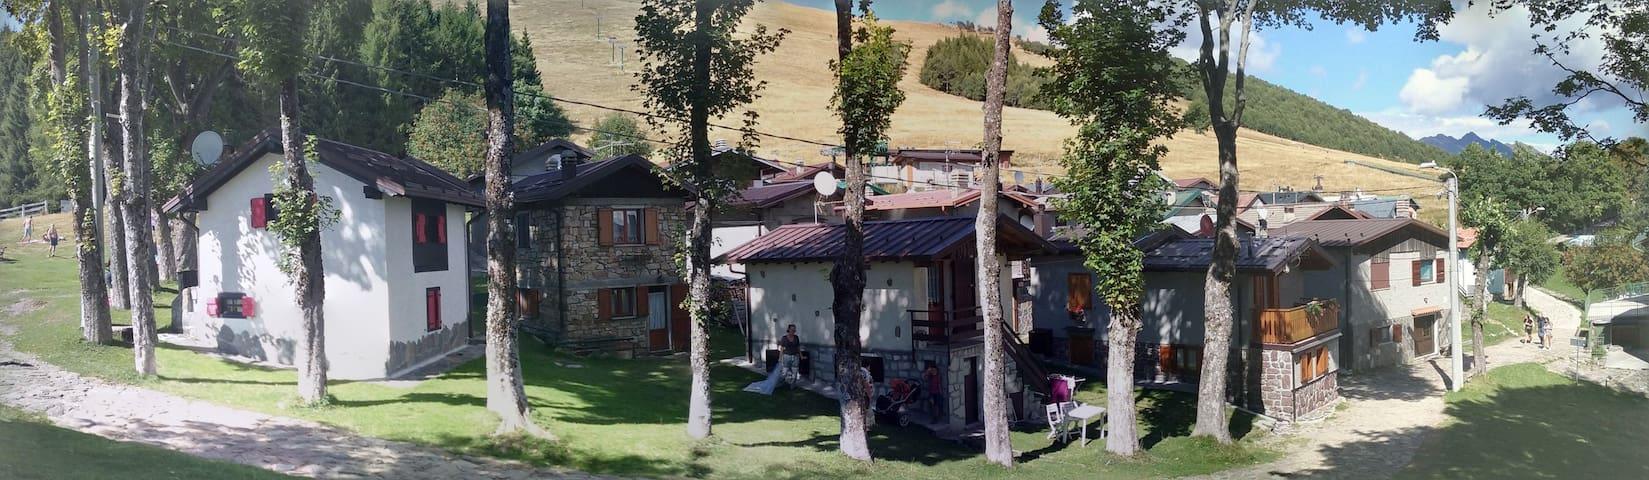 baita in paradiso incontaminato - Giumello - Bungalo